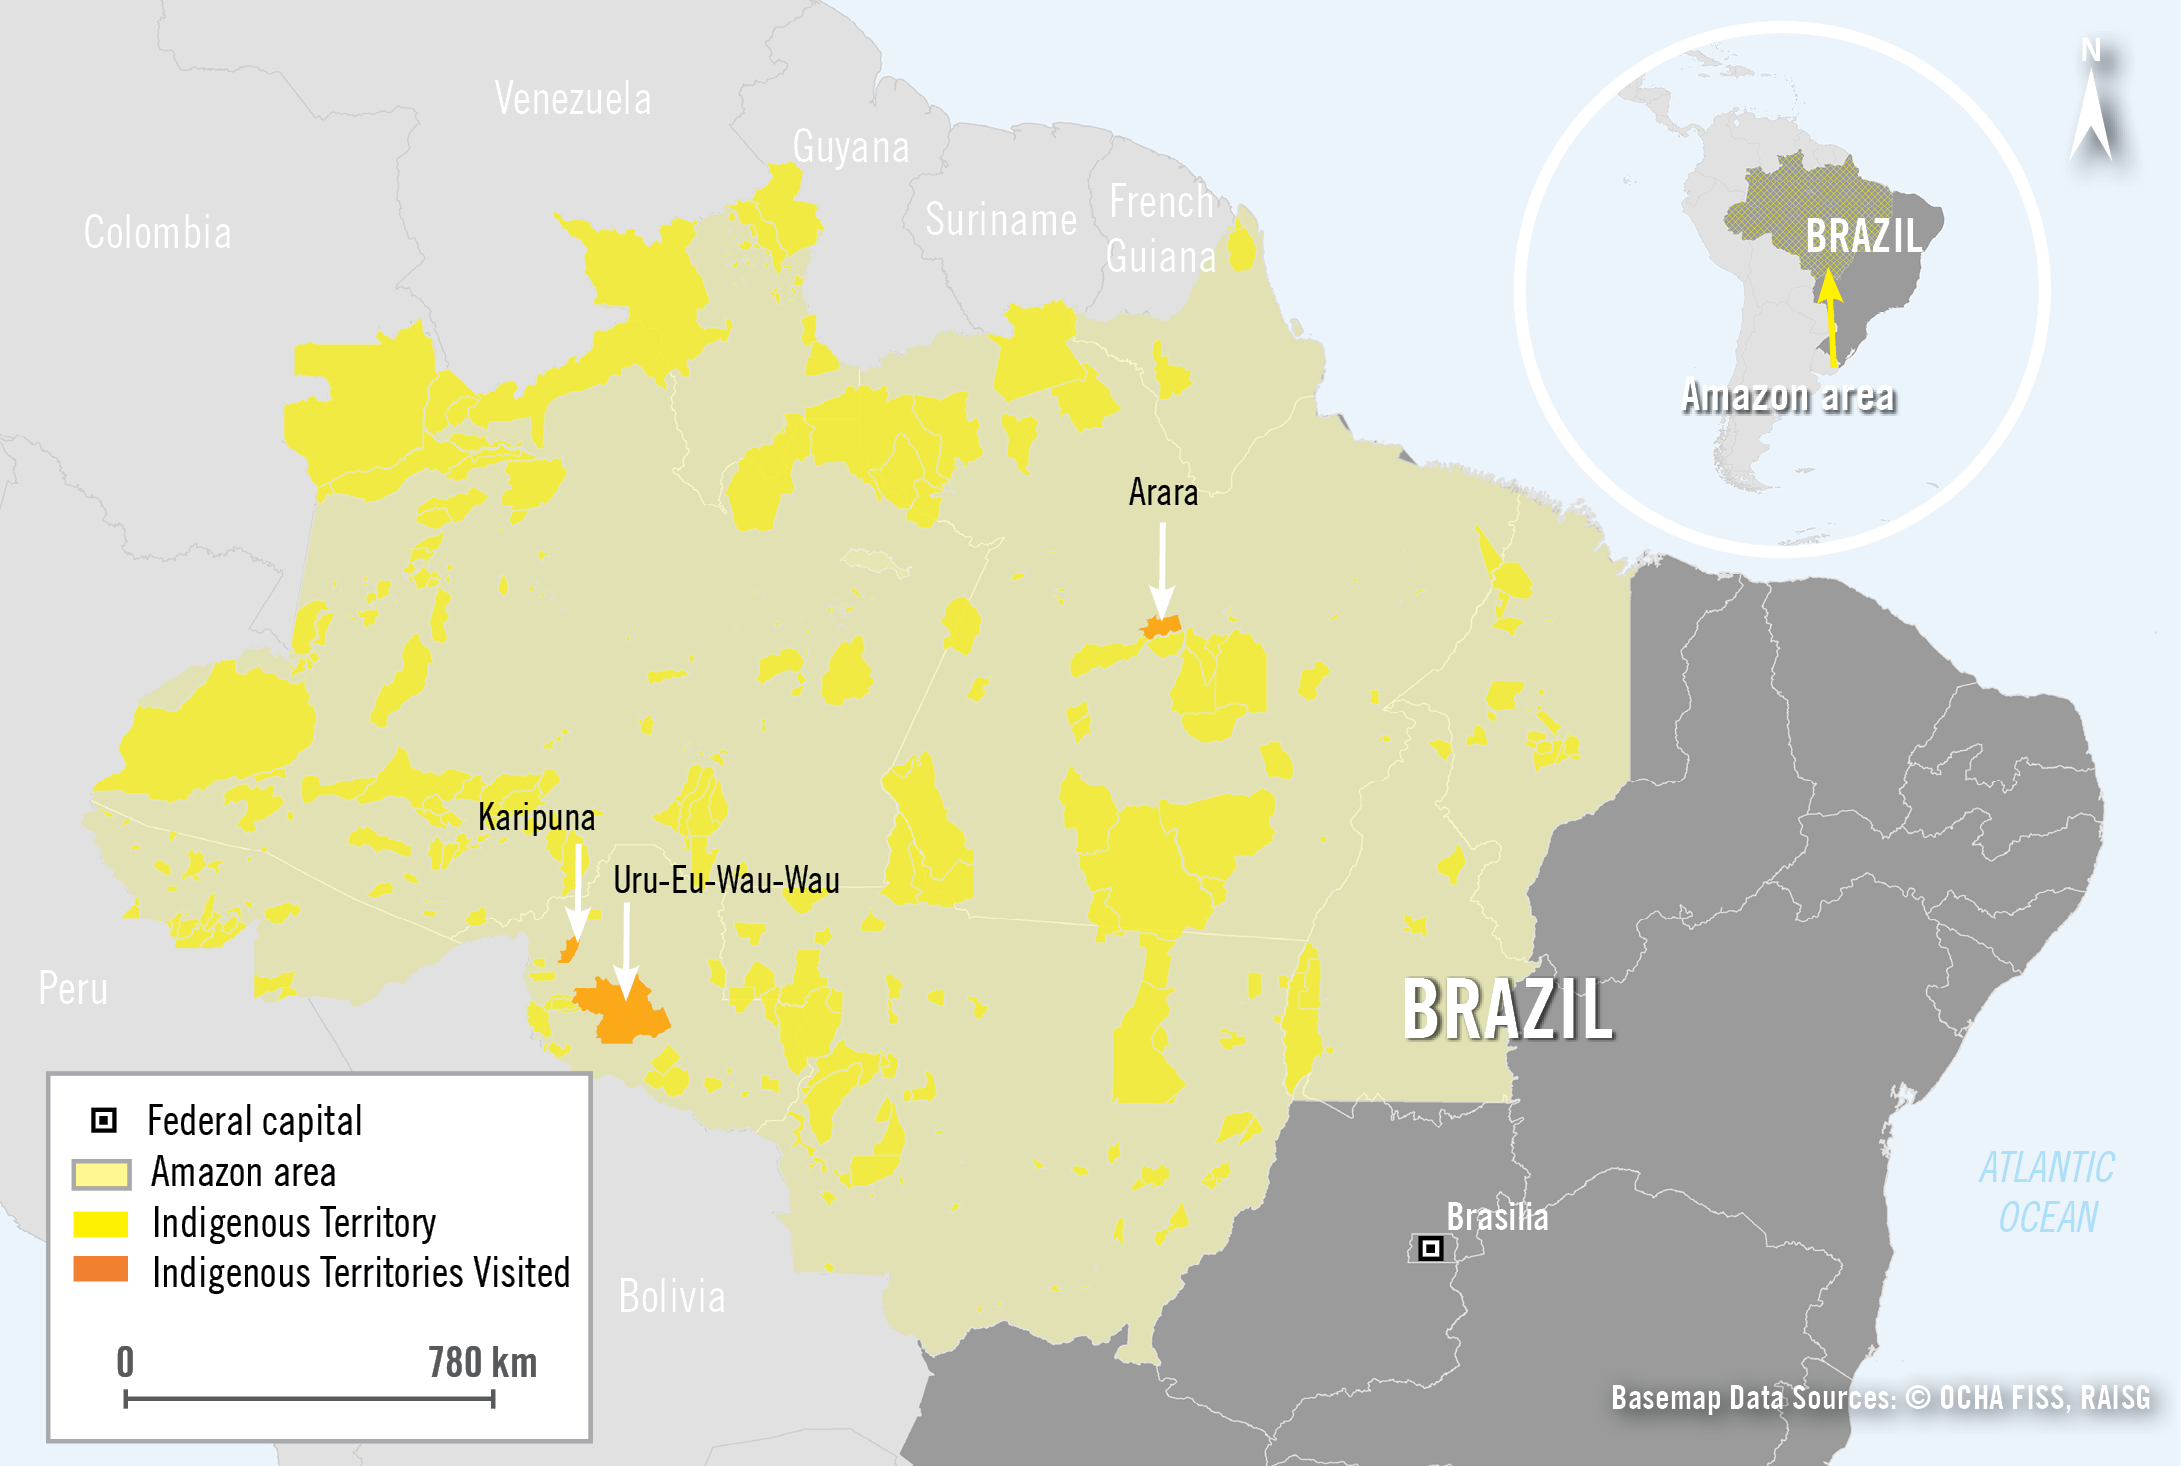 261984 Amazonas-Region-Brasilien-Karte | © Basemap data sources OCHA FISS, RAISG/Amnesty Interntional